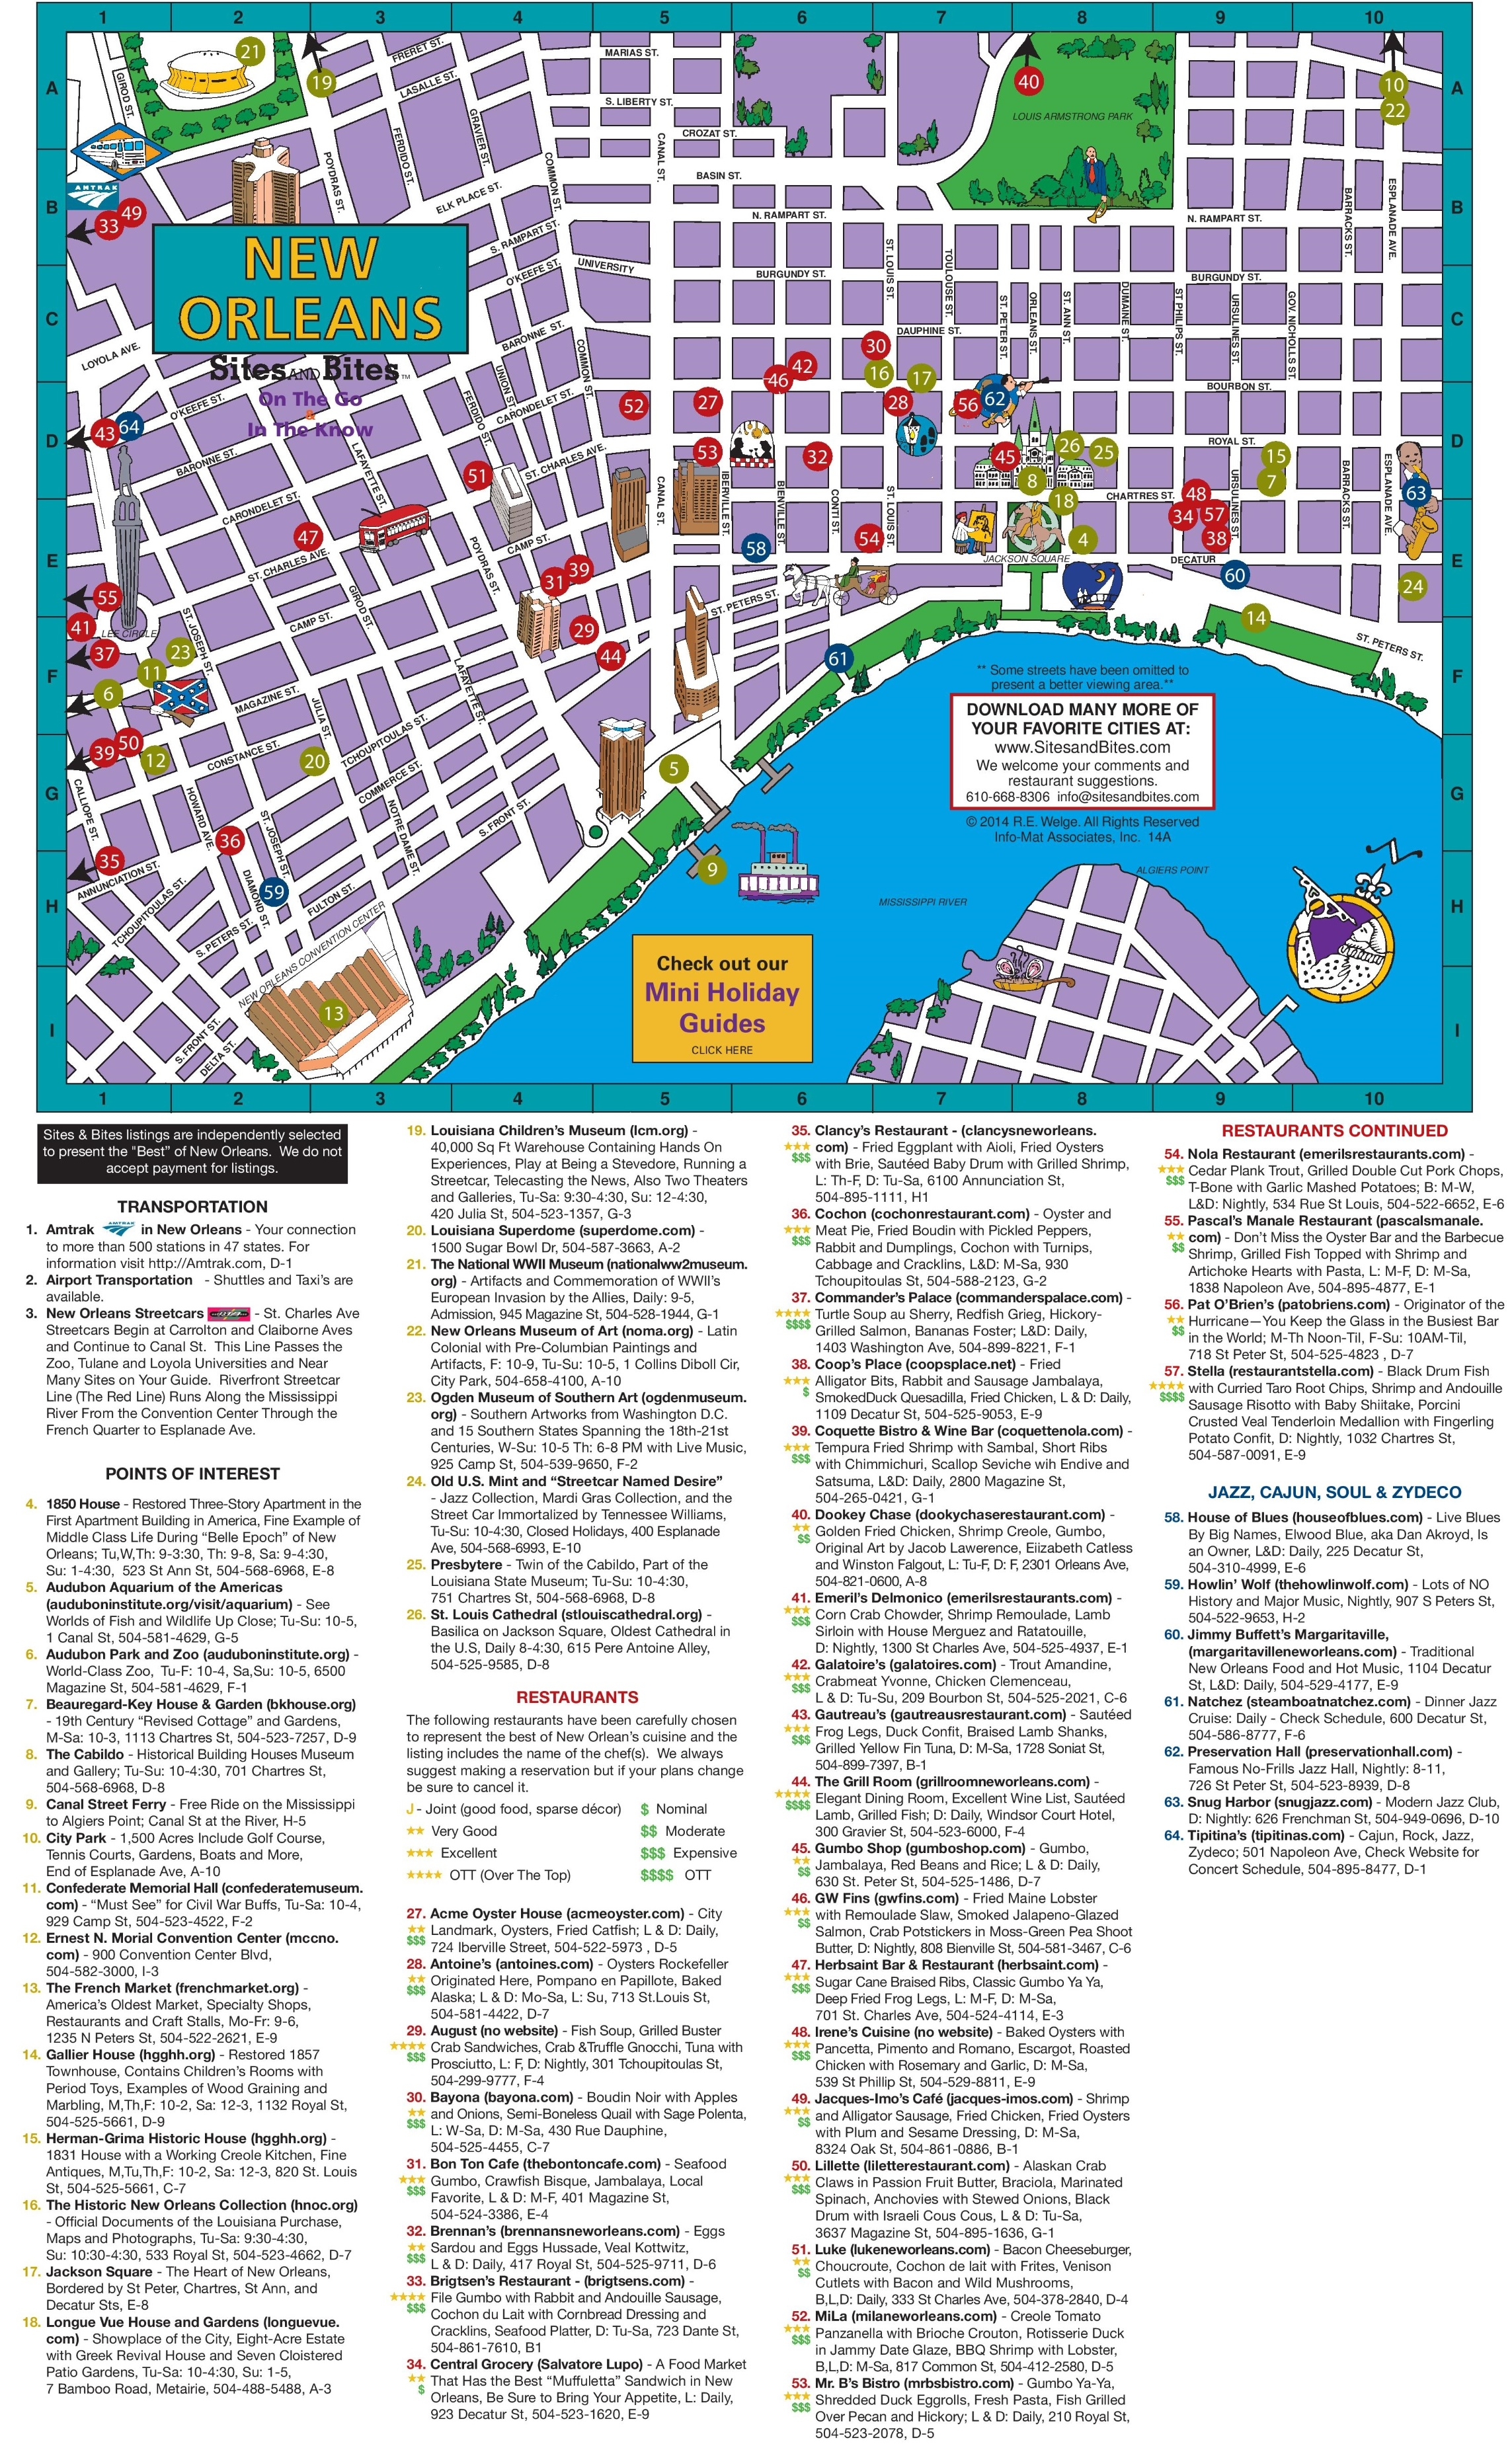 ... Gallery New Orleans Tourist Map Edi Maps Full HD Maps Walking Tour Map  Creative Stupefying Garden District New Orleans Walking Tour Map Creative  Ideas ...